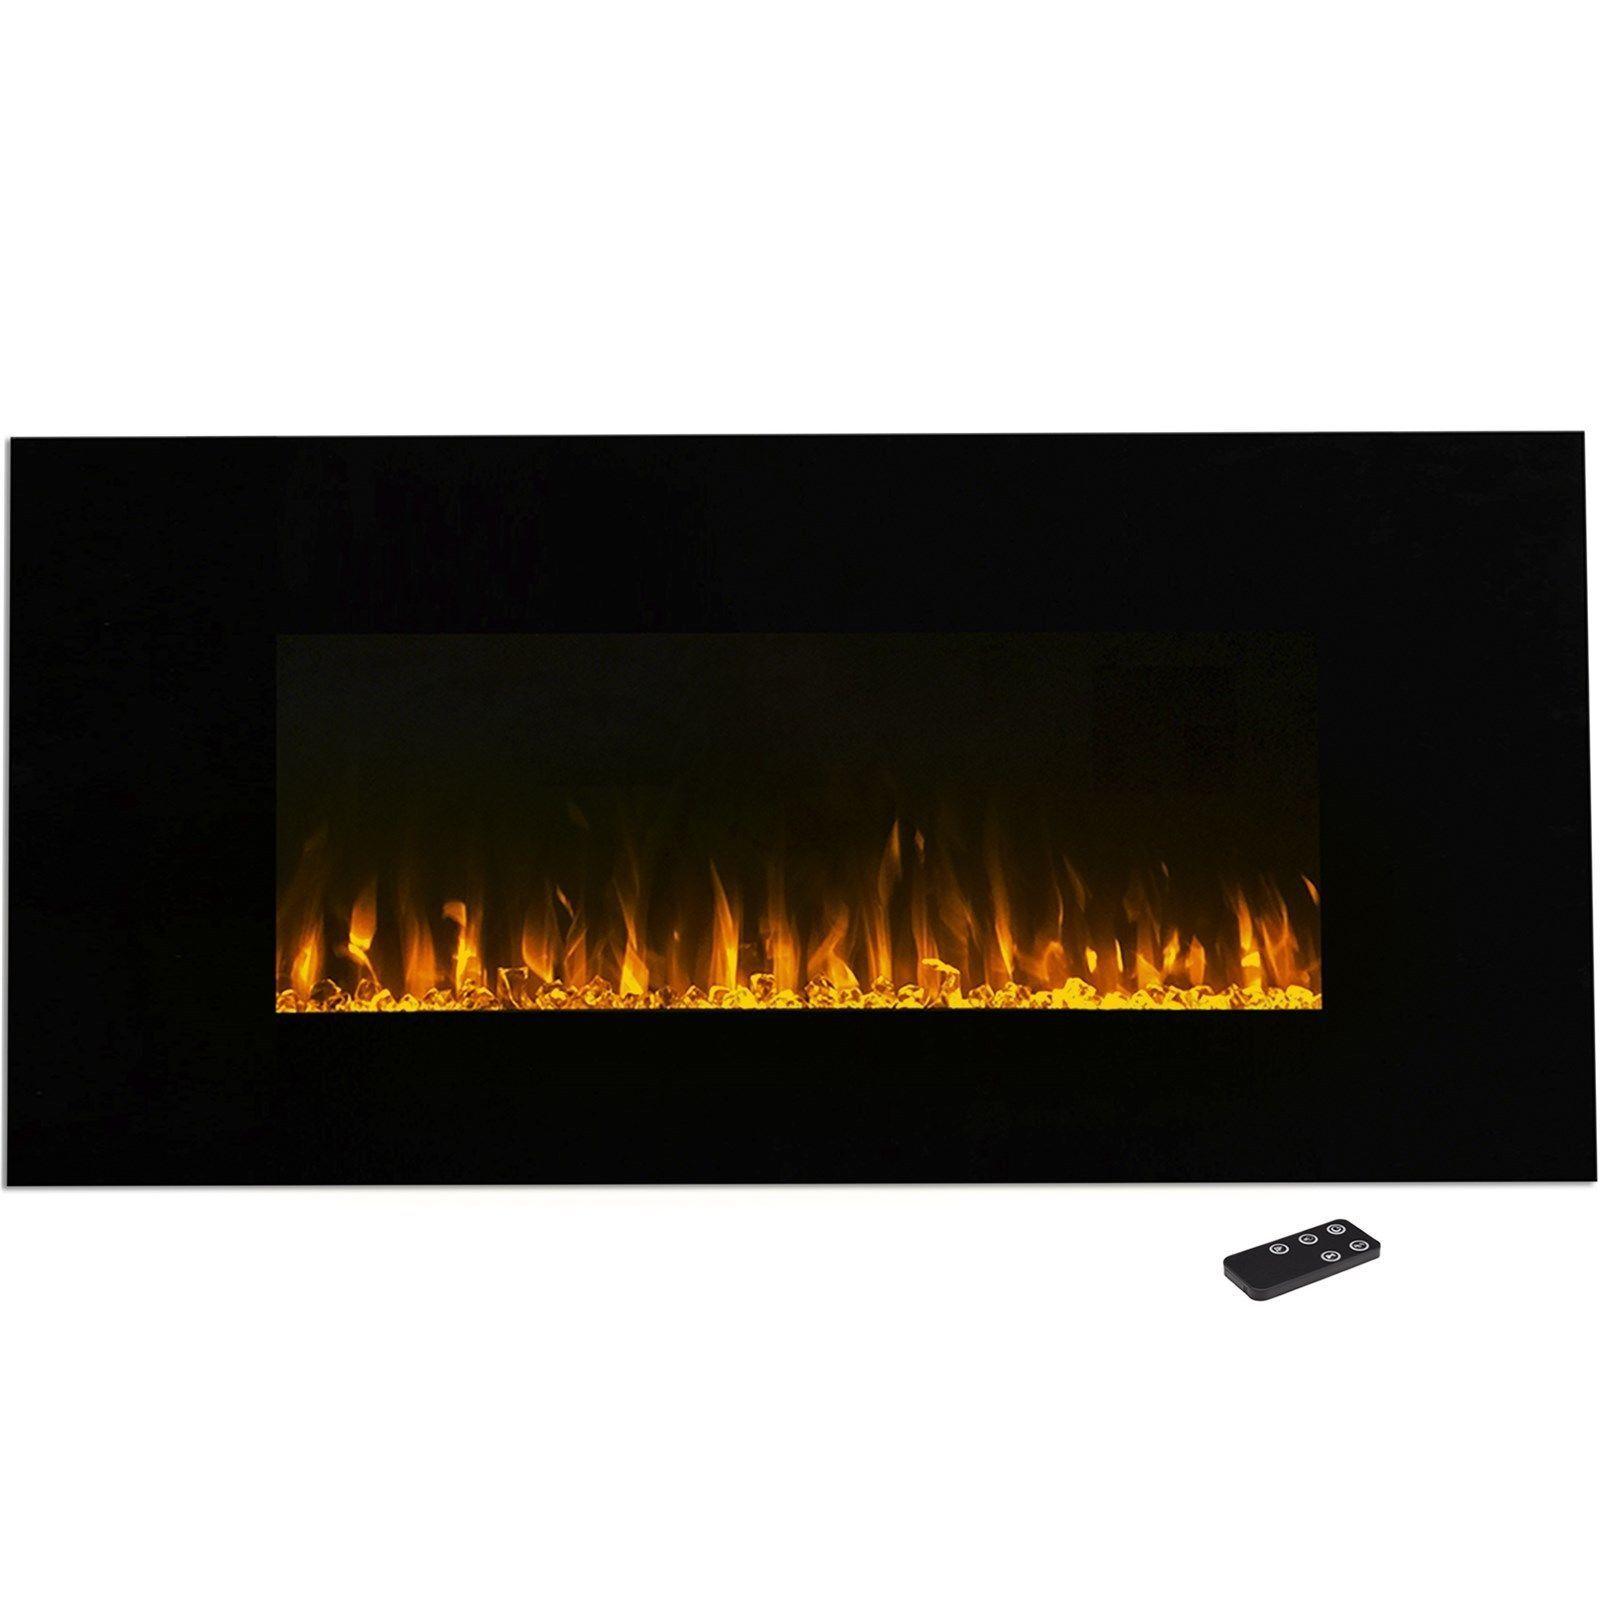 fireplace northwest av calgary alberta l listing mls attached property